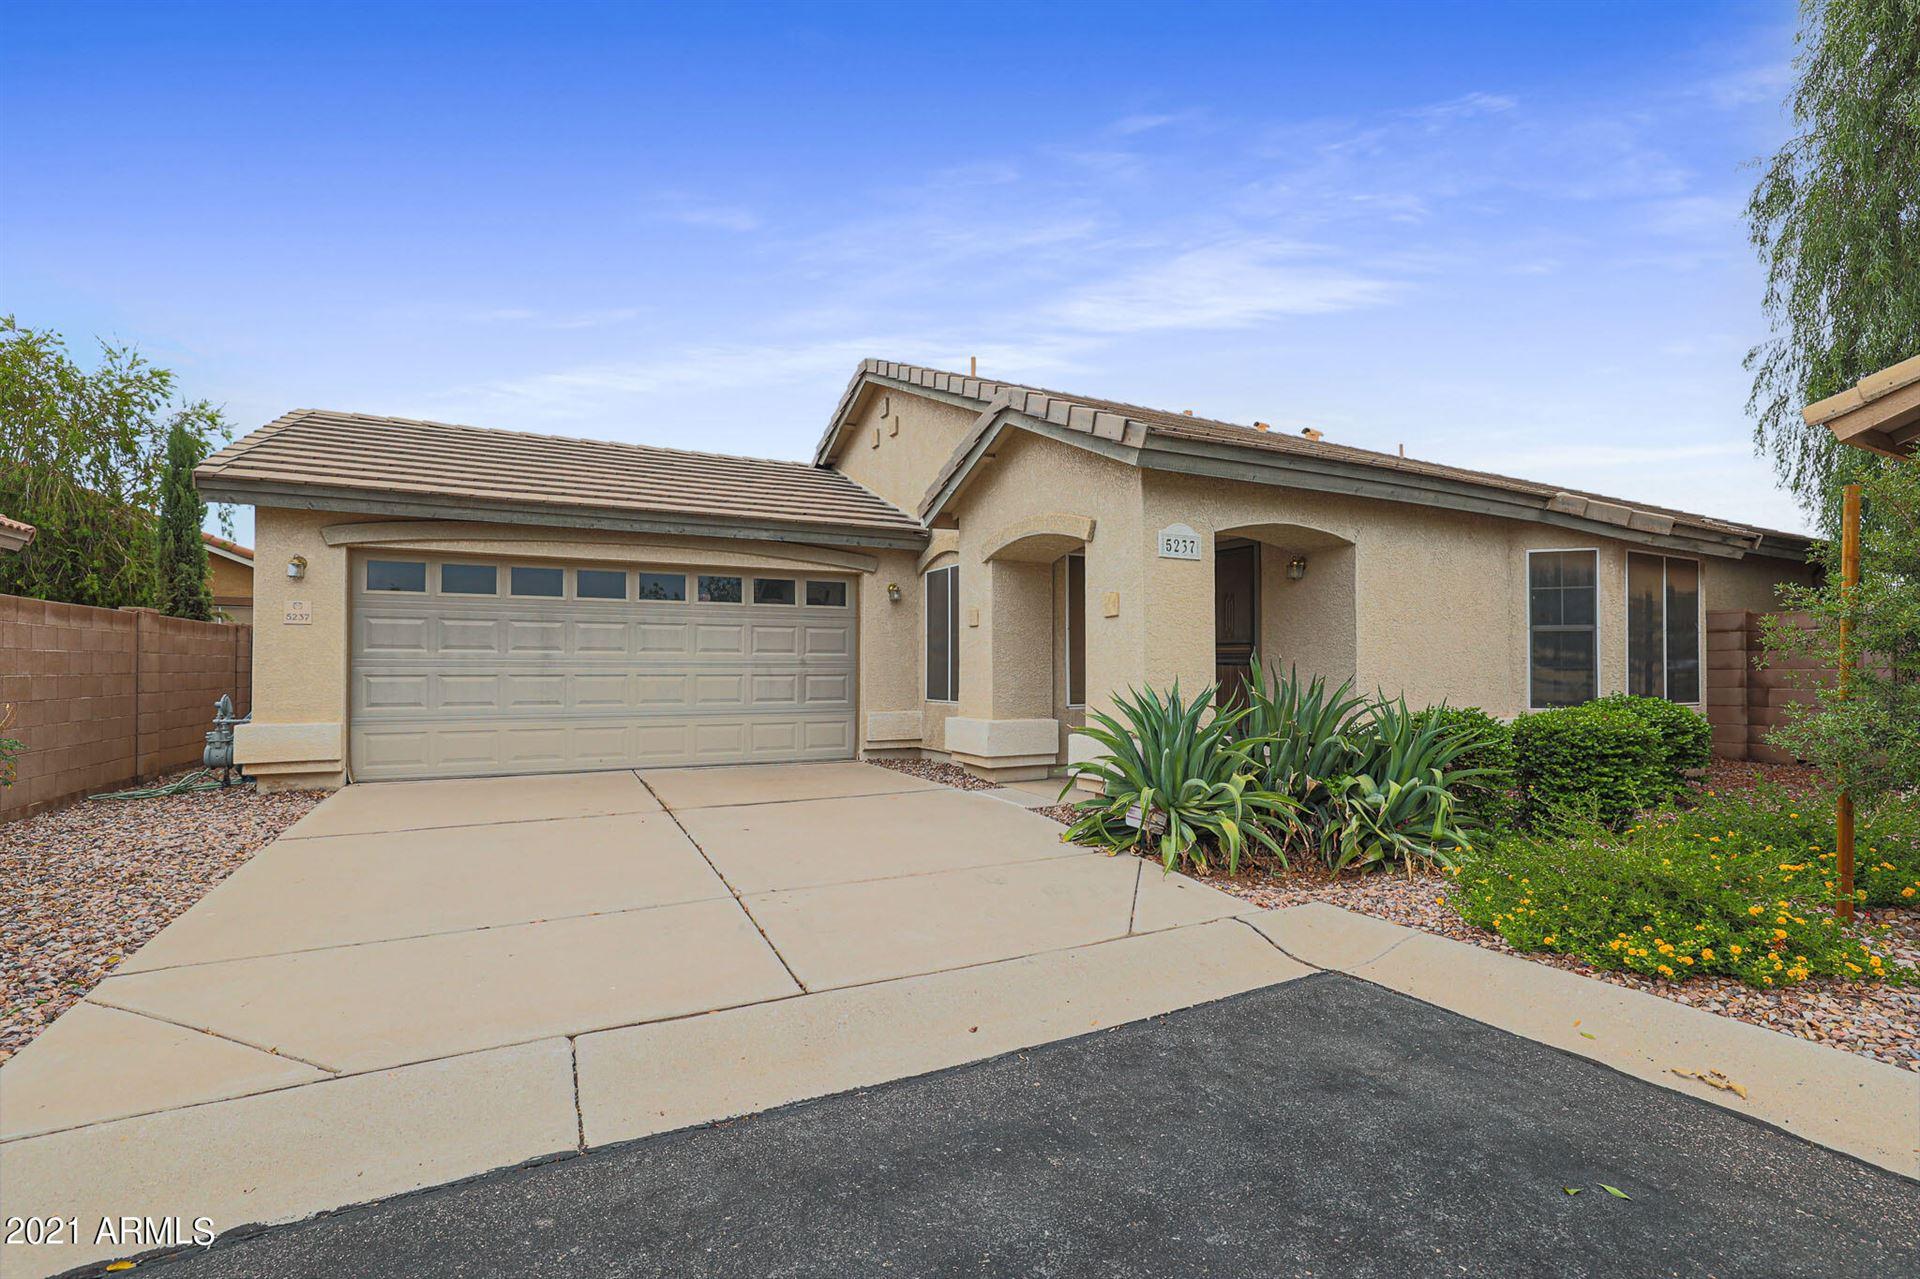 5237 E INGRAM Street, Mesa, AZ 85205 - MLS#: 6266740